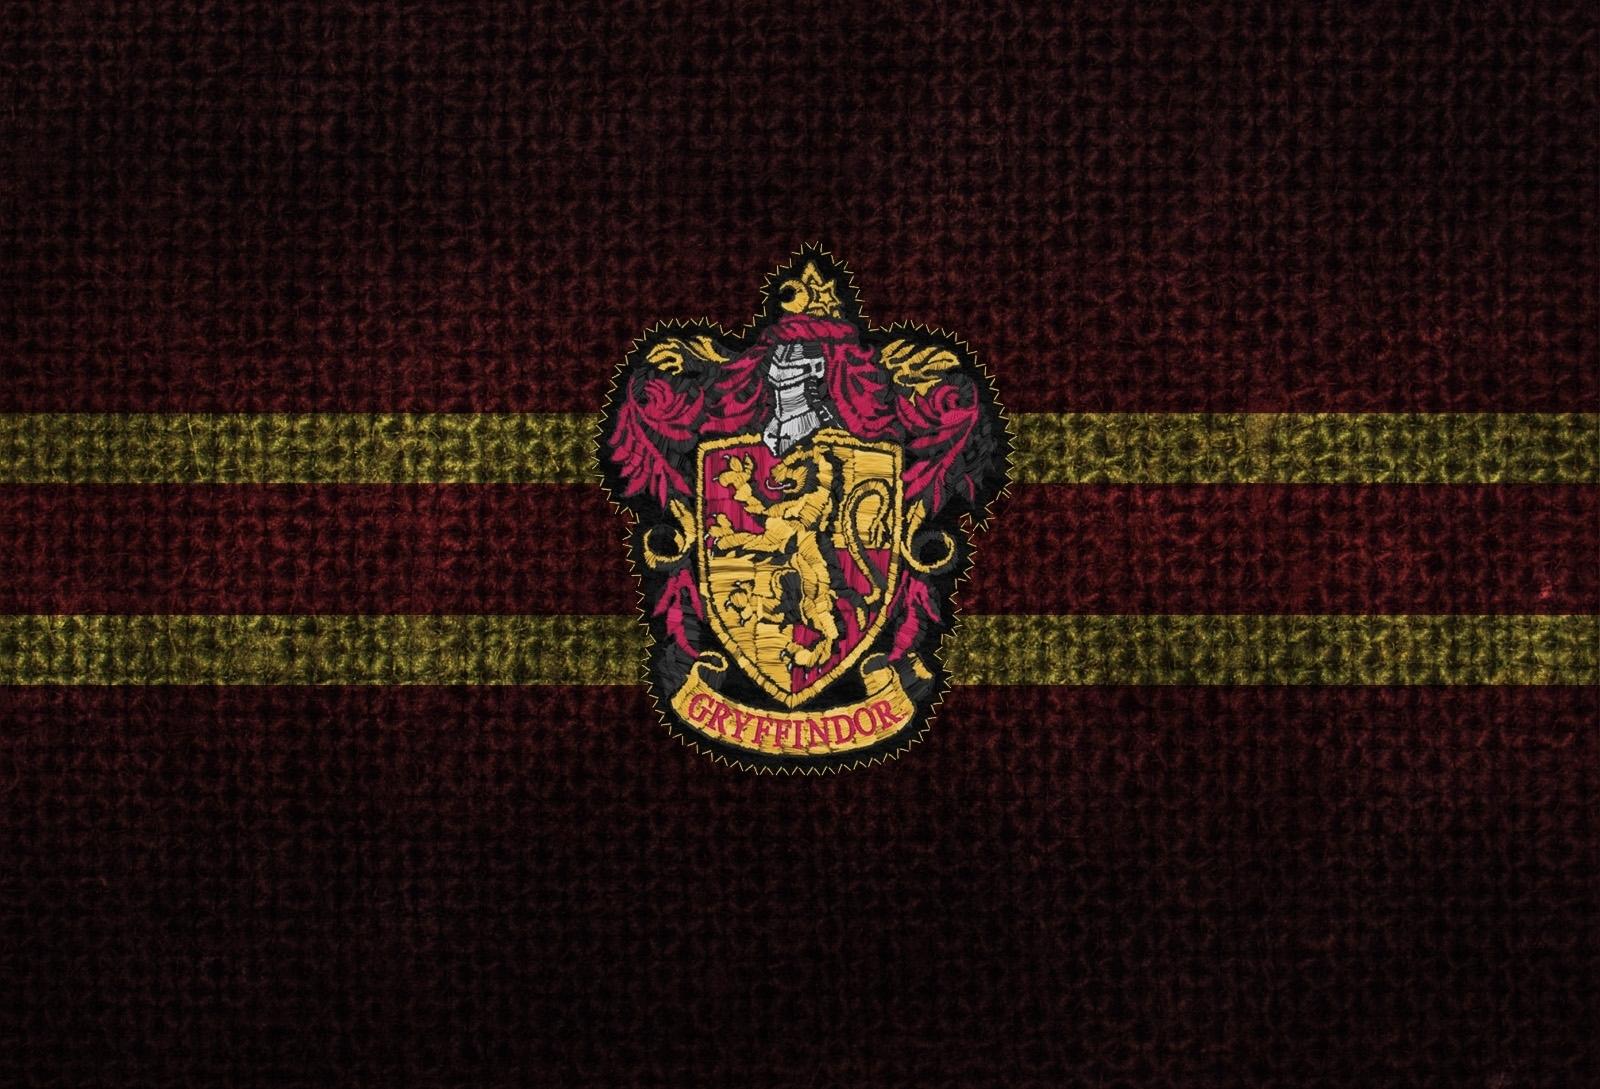 Cool Wallpaper Harry Potter 1080p - harry-potter-crest-gryffindor-hogwarts-1600x1089-wallpaper-high  Graphic_423487.jpg